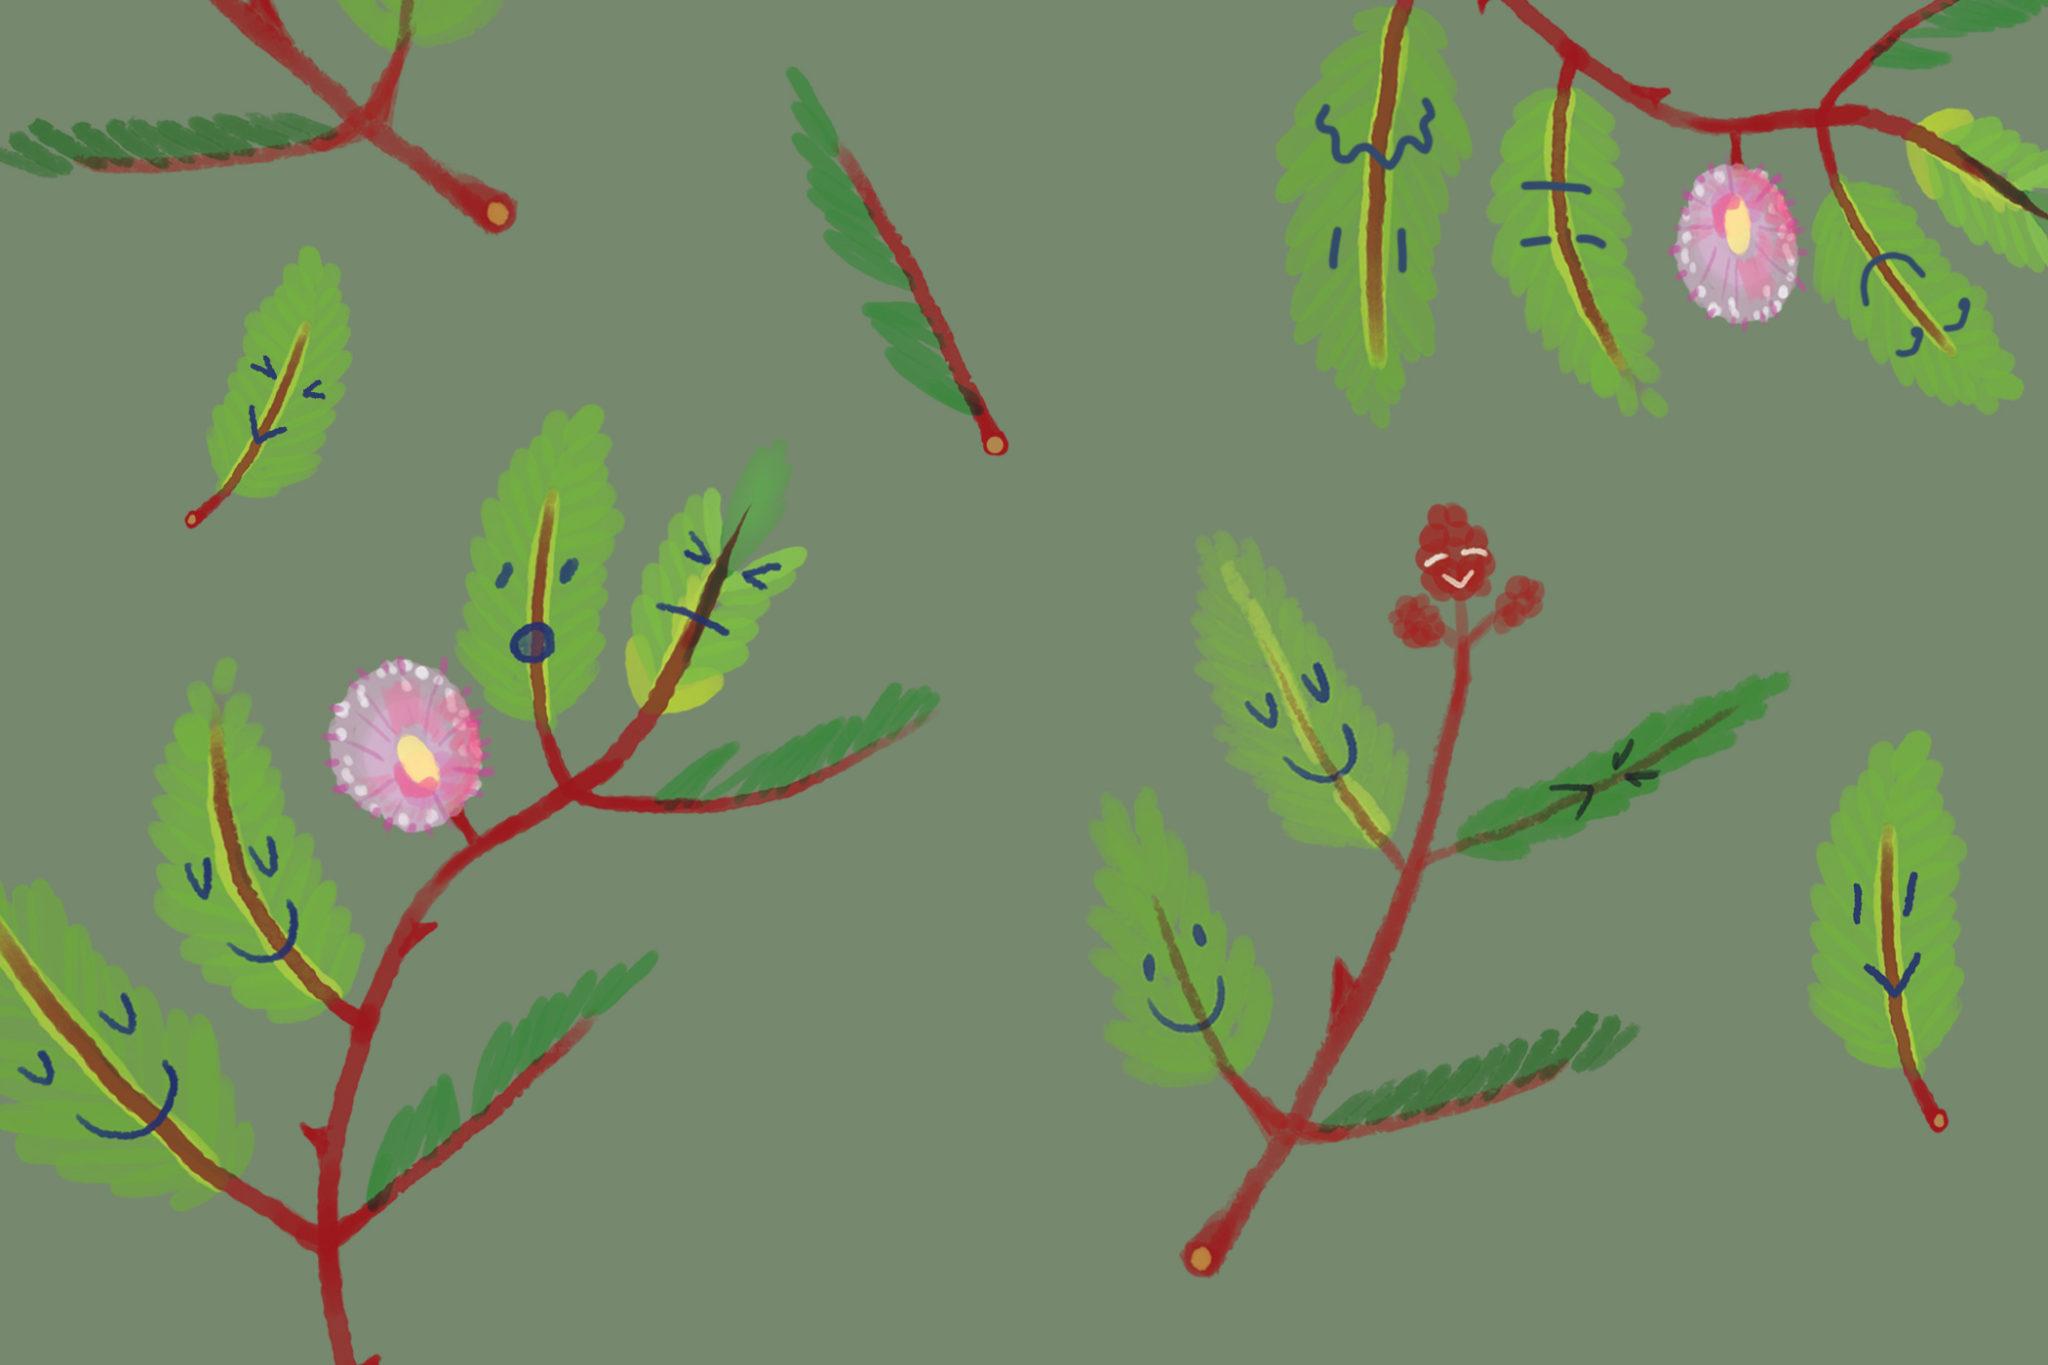 A Hui Hou - Sentiments on Sleeping Grass